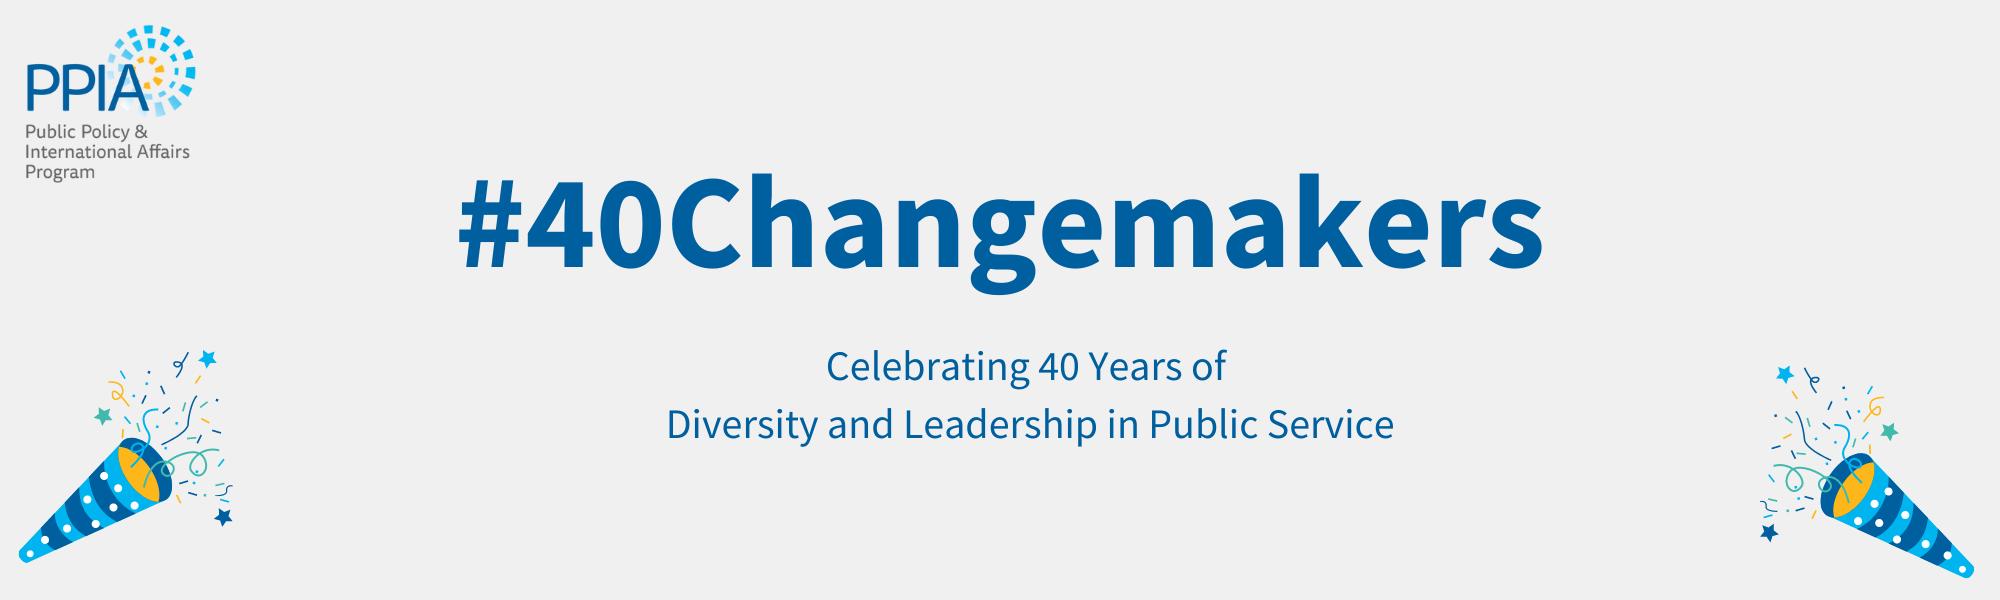 Celebrating 40 Years: 40 Changemakers Alumni Profiles